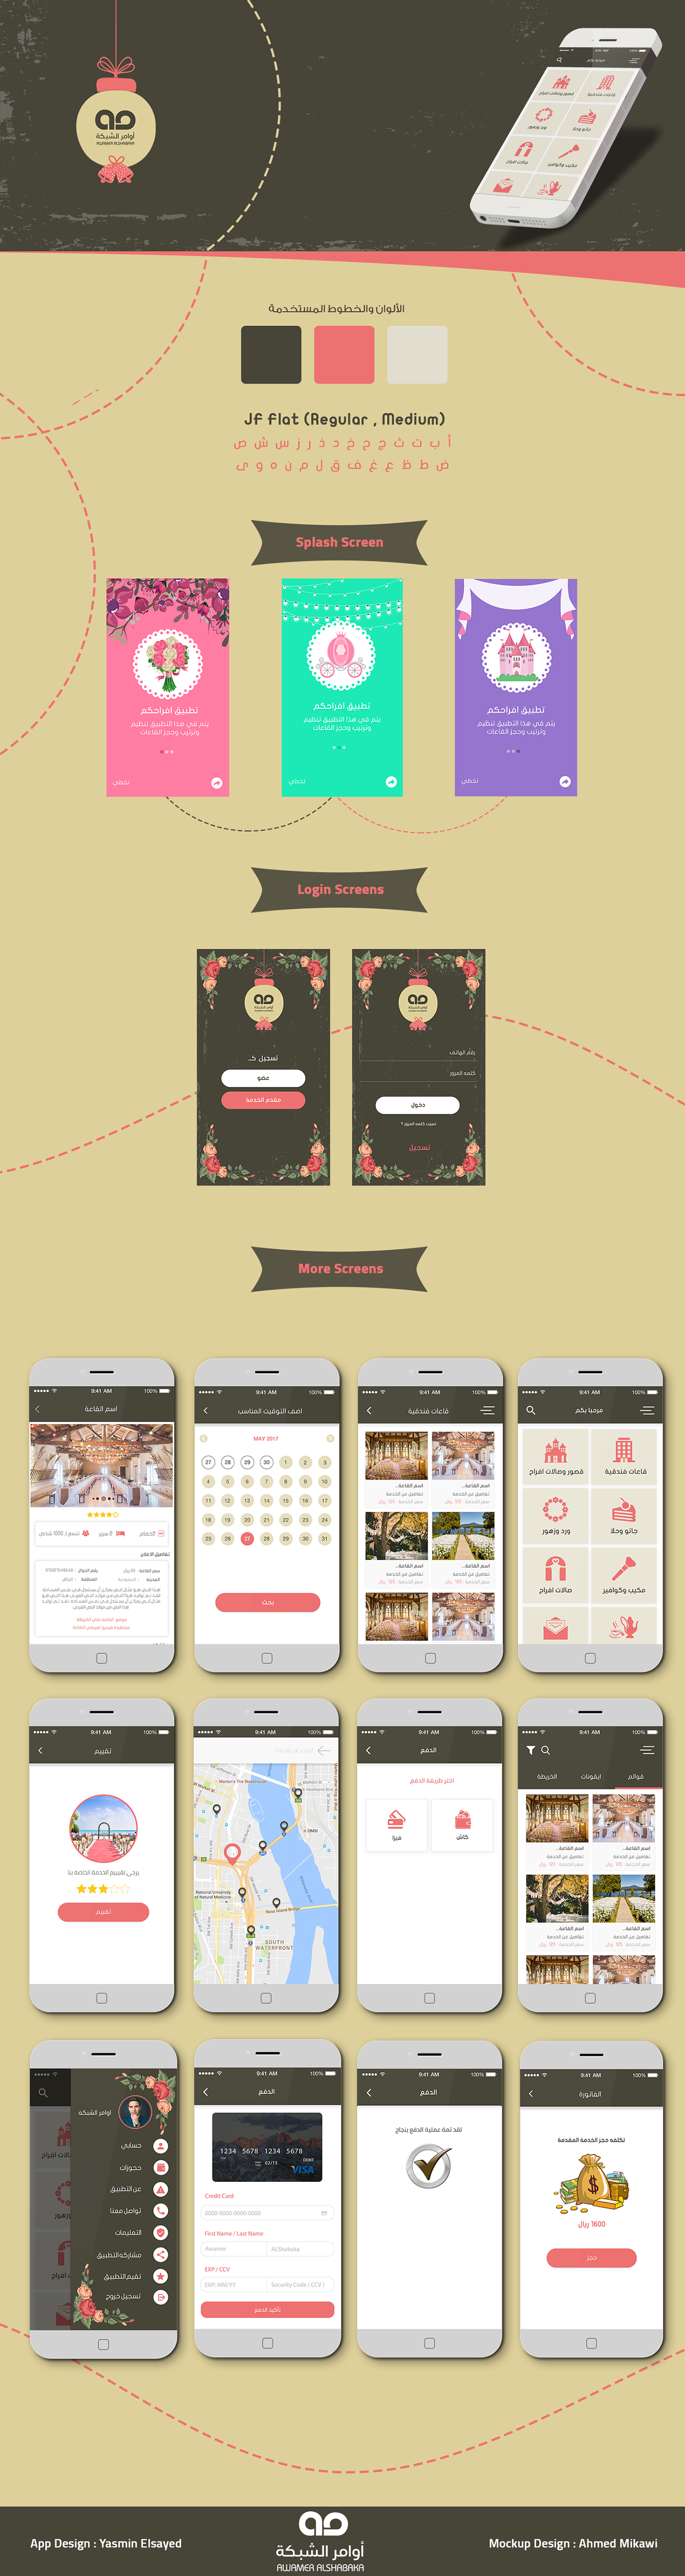 UI,ux,app,mobile,Mobile app